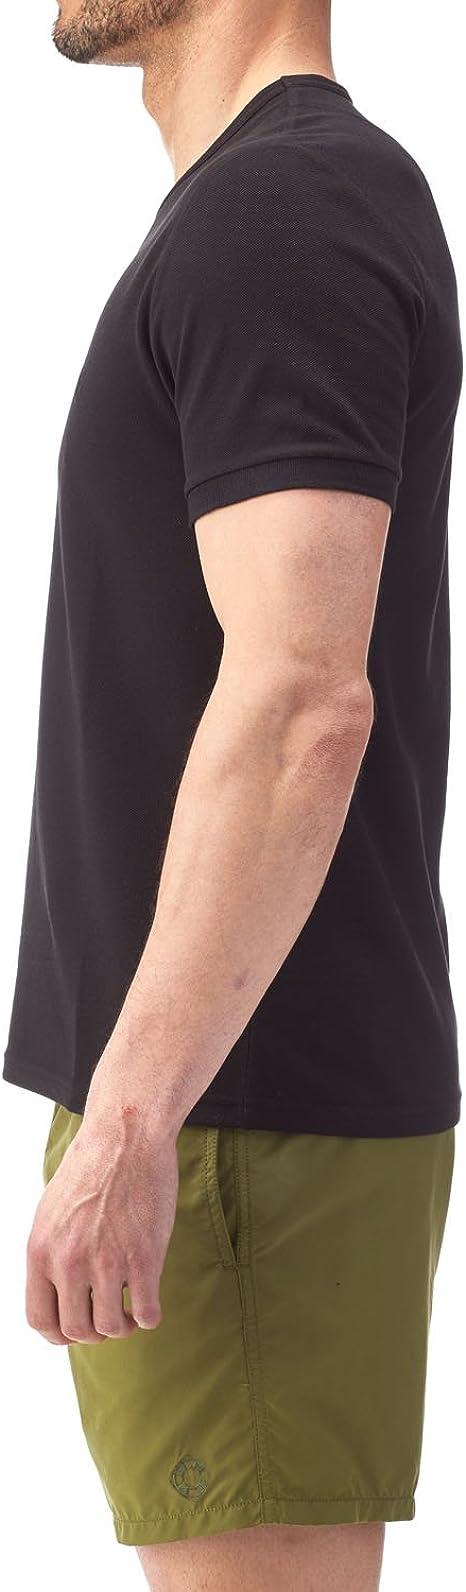 Camiseta Lisa de Cuello Redondo en piqué de algodón - Hombres ...